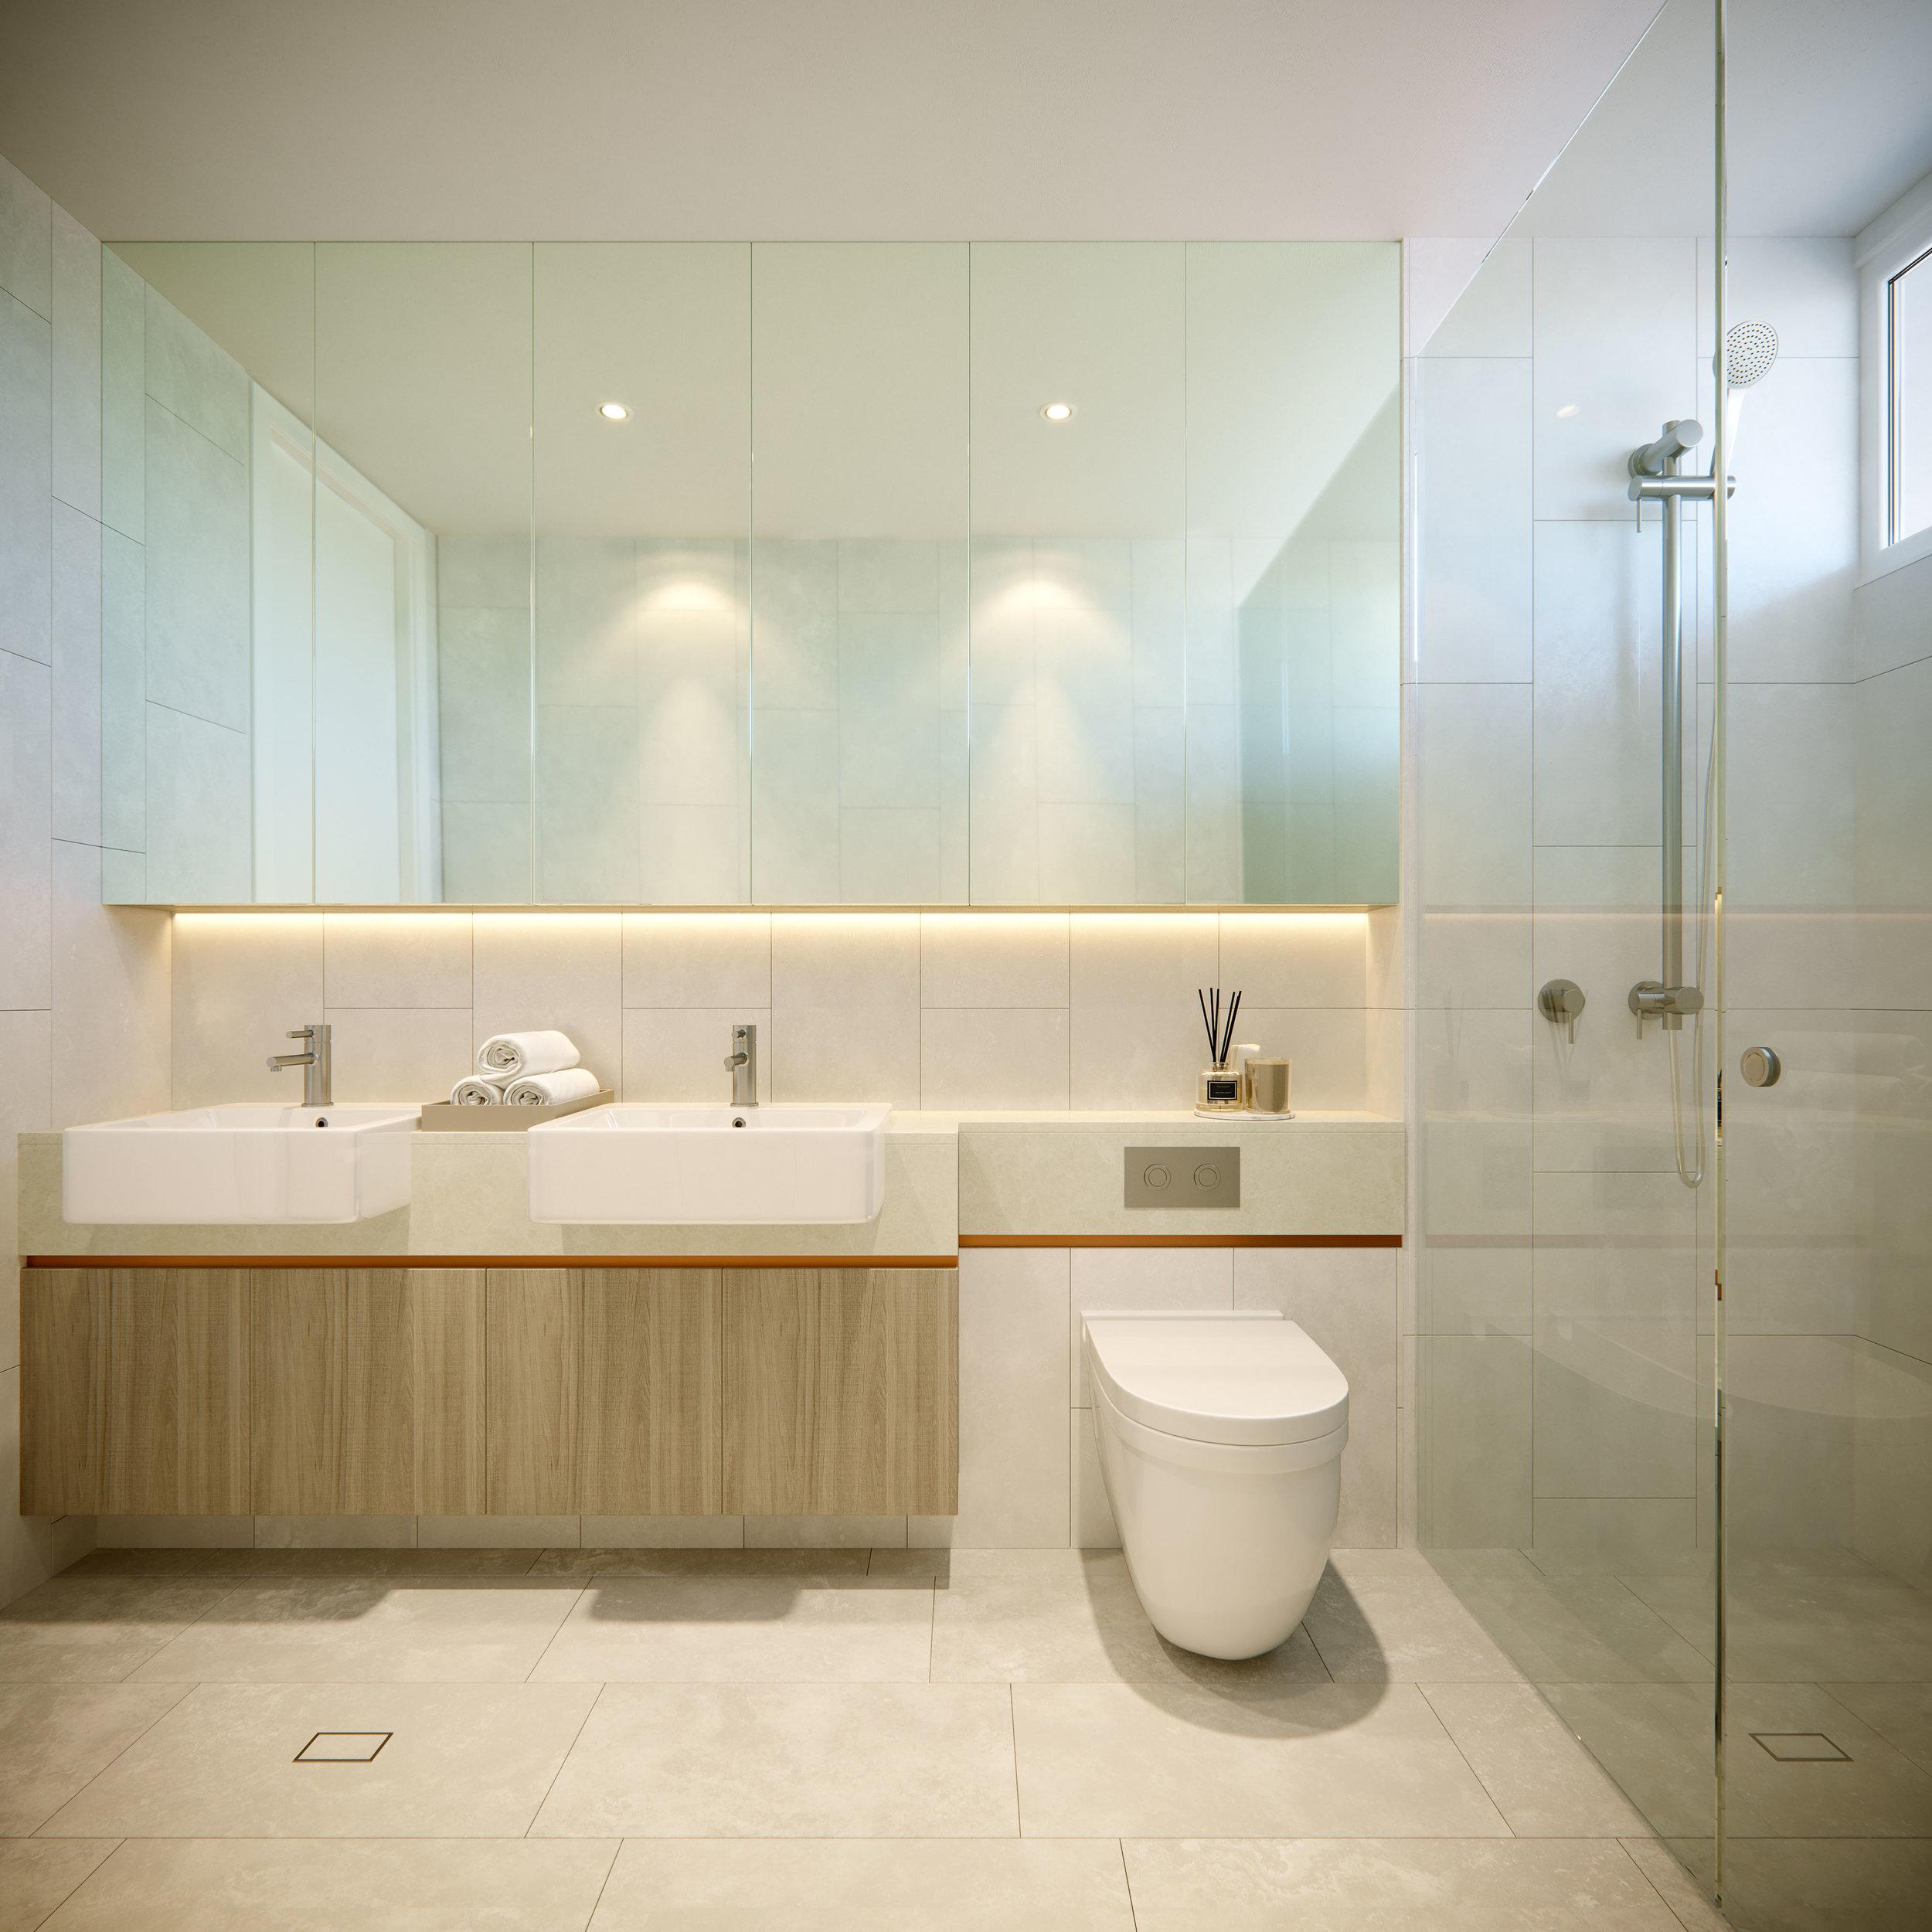 E06_2Ba-bathroom_05.jpg